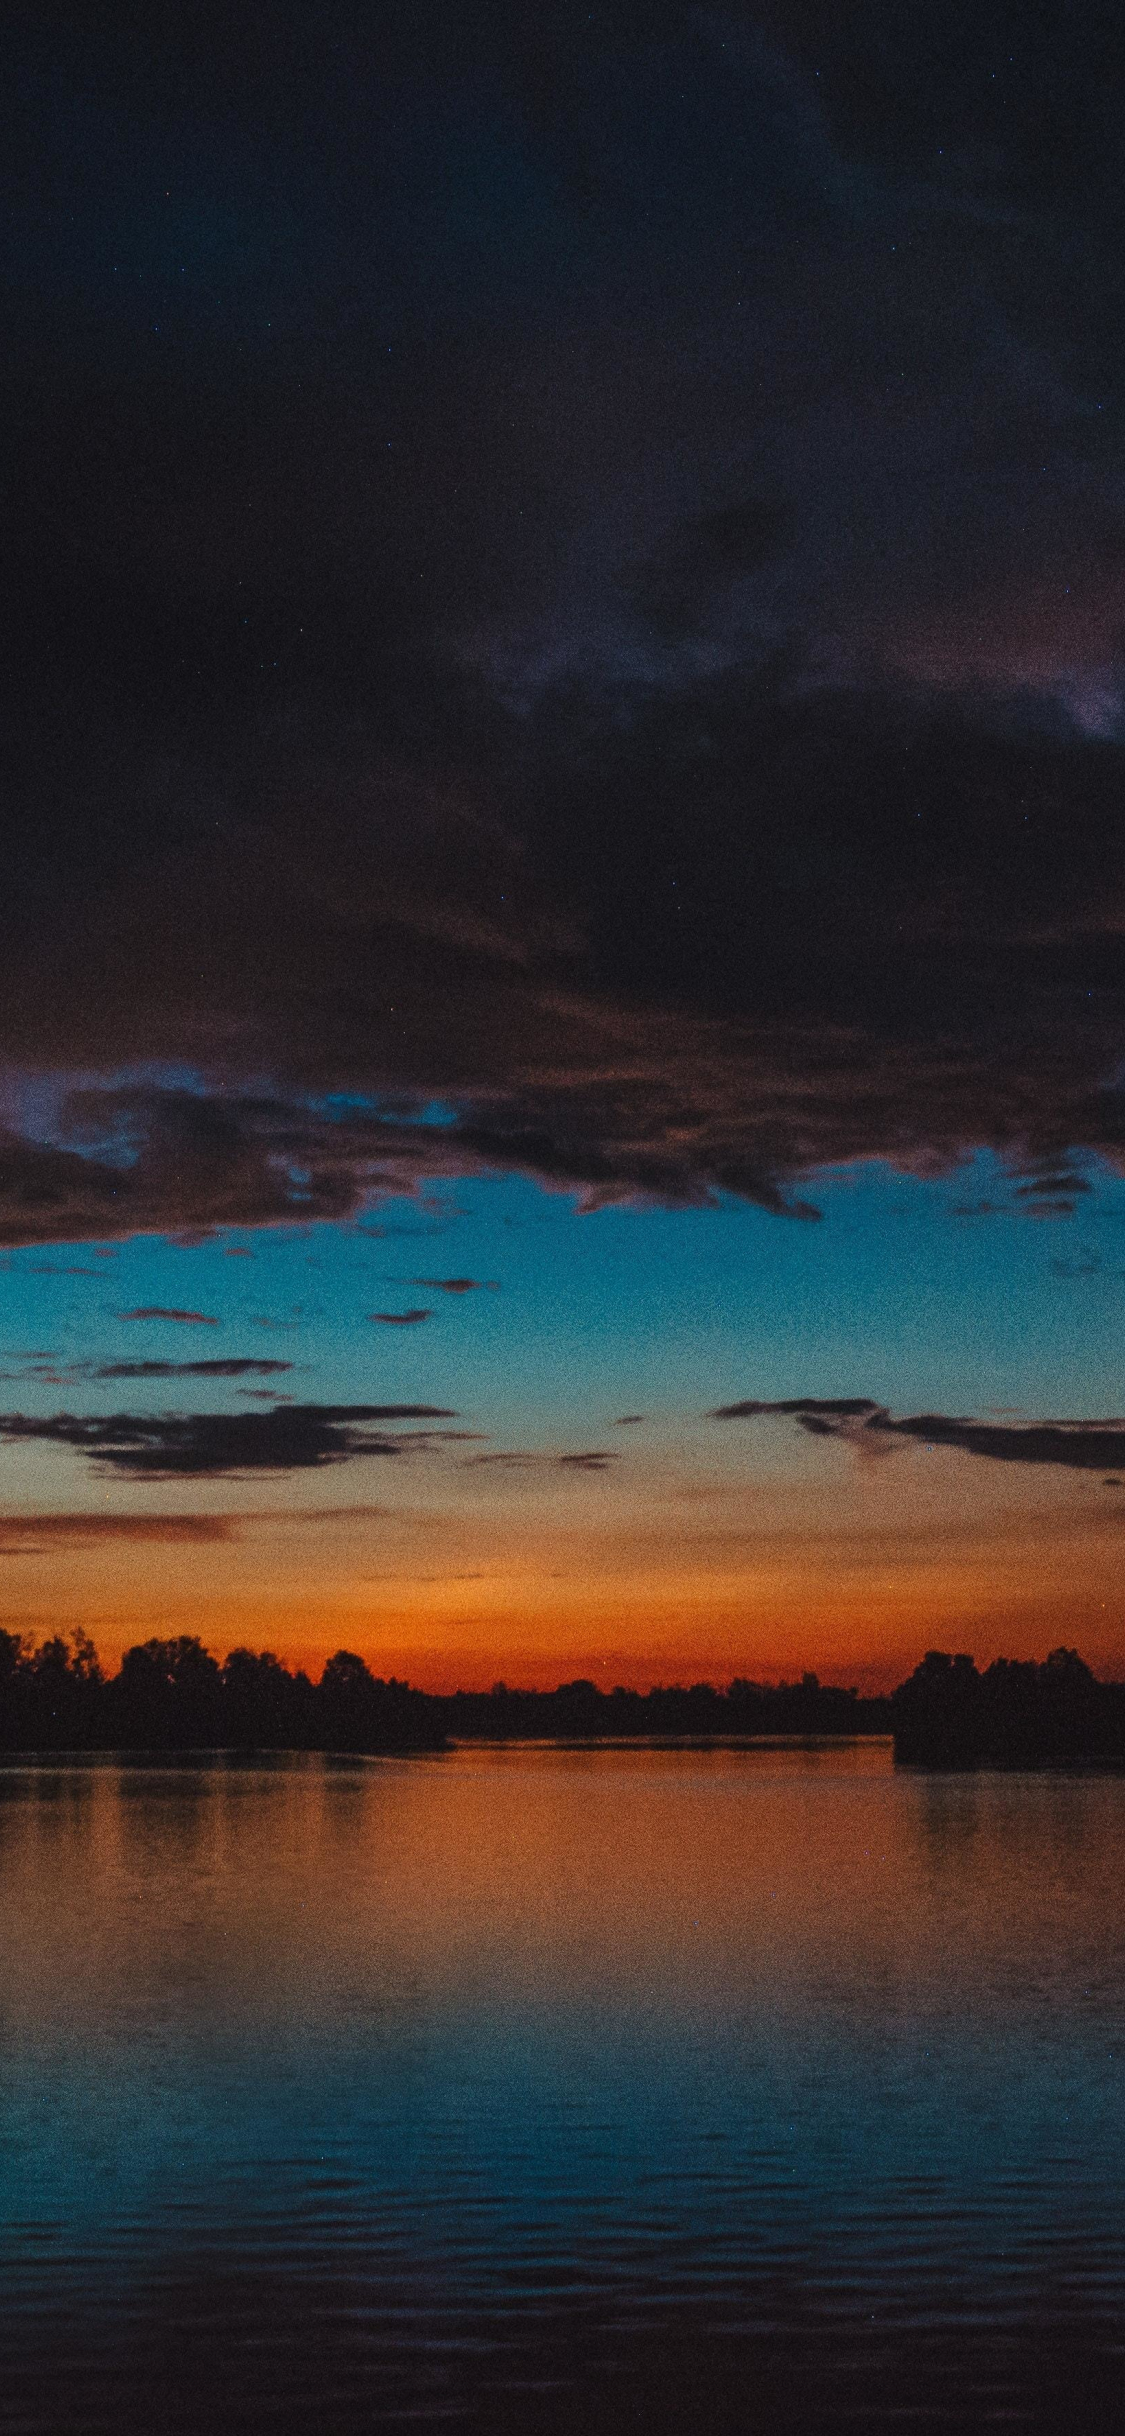 Download 1125x2436 Wallpaper Lake Clouds Sunset Dark Iphone X 1125x2436 Hd Image Background 18005